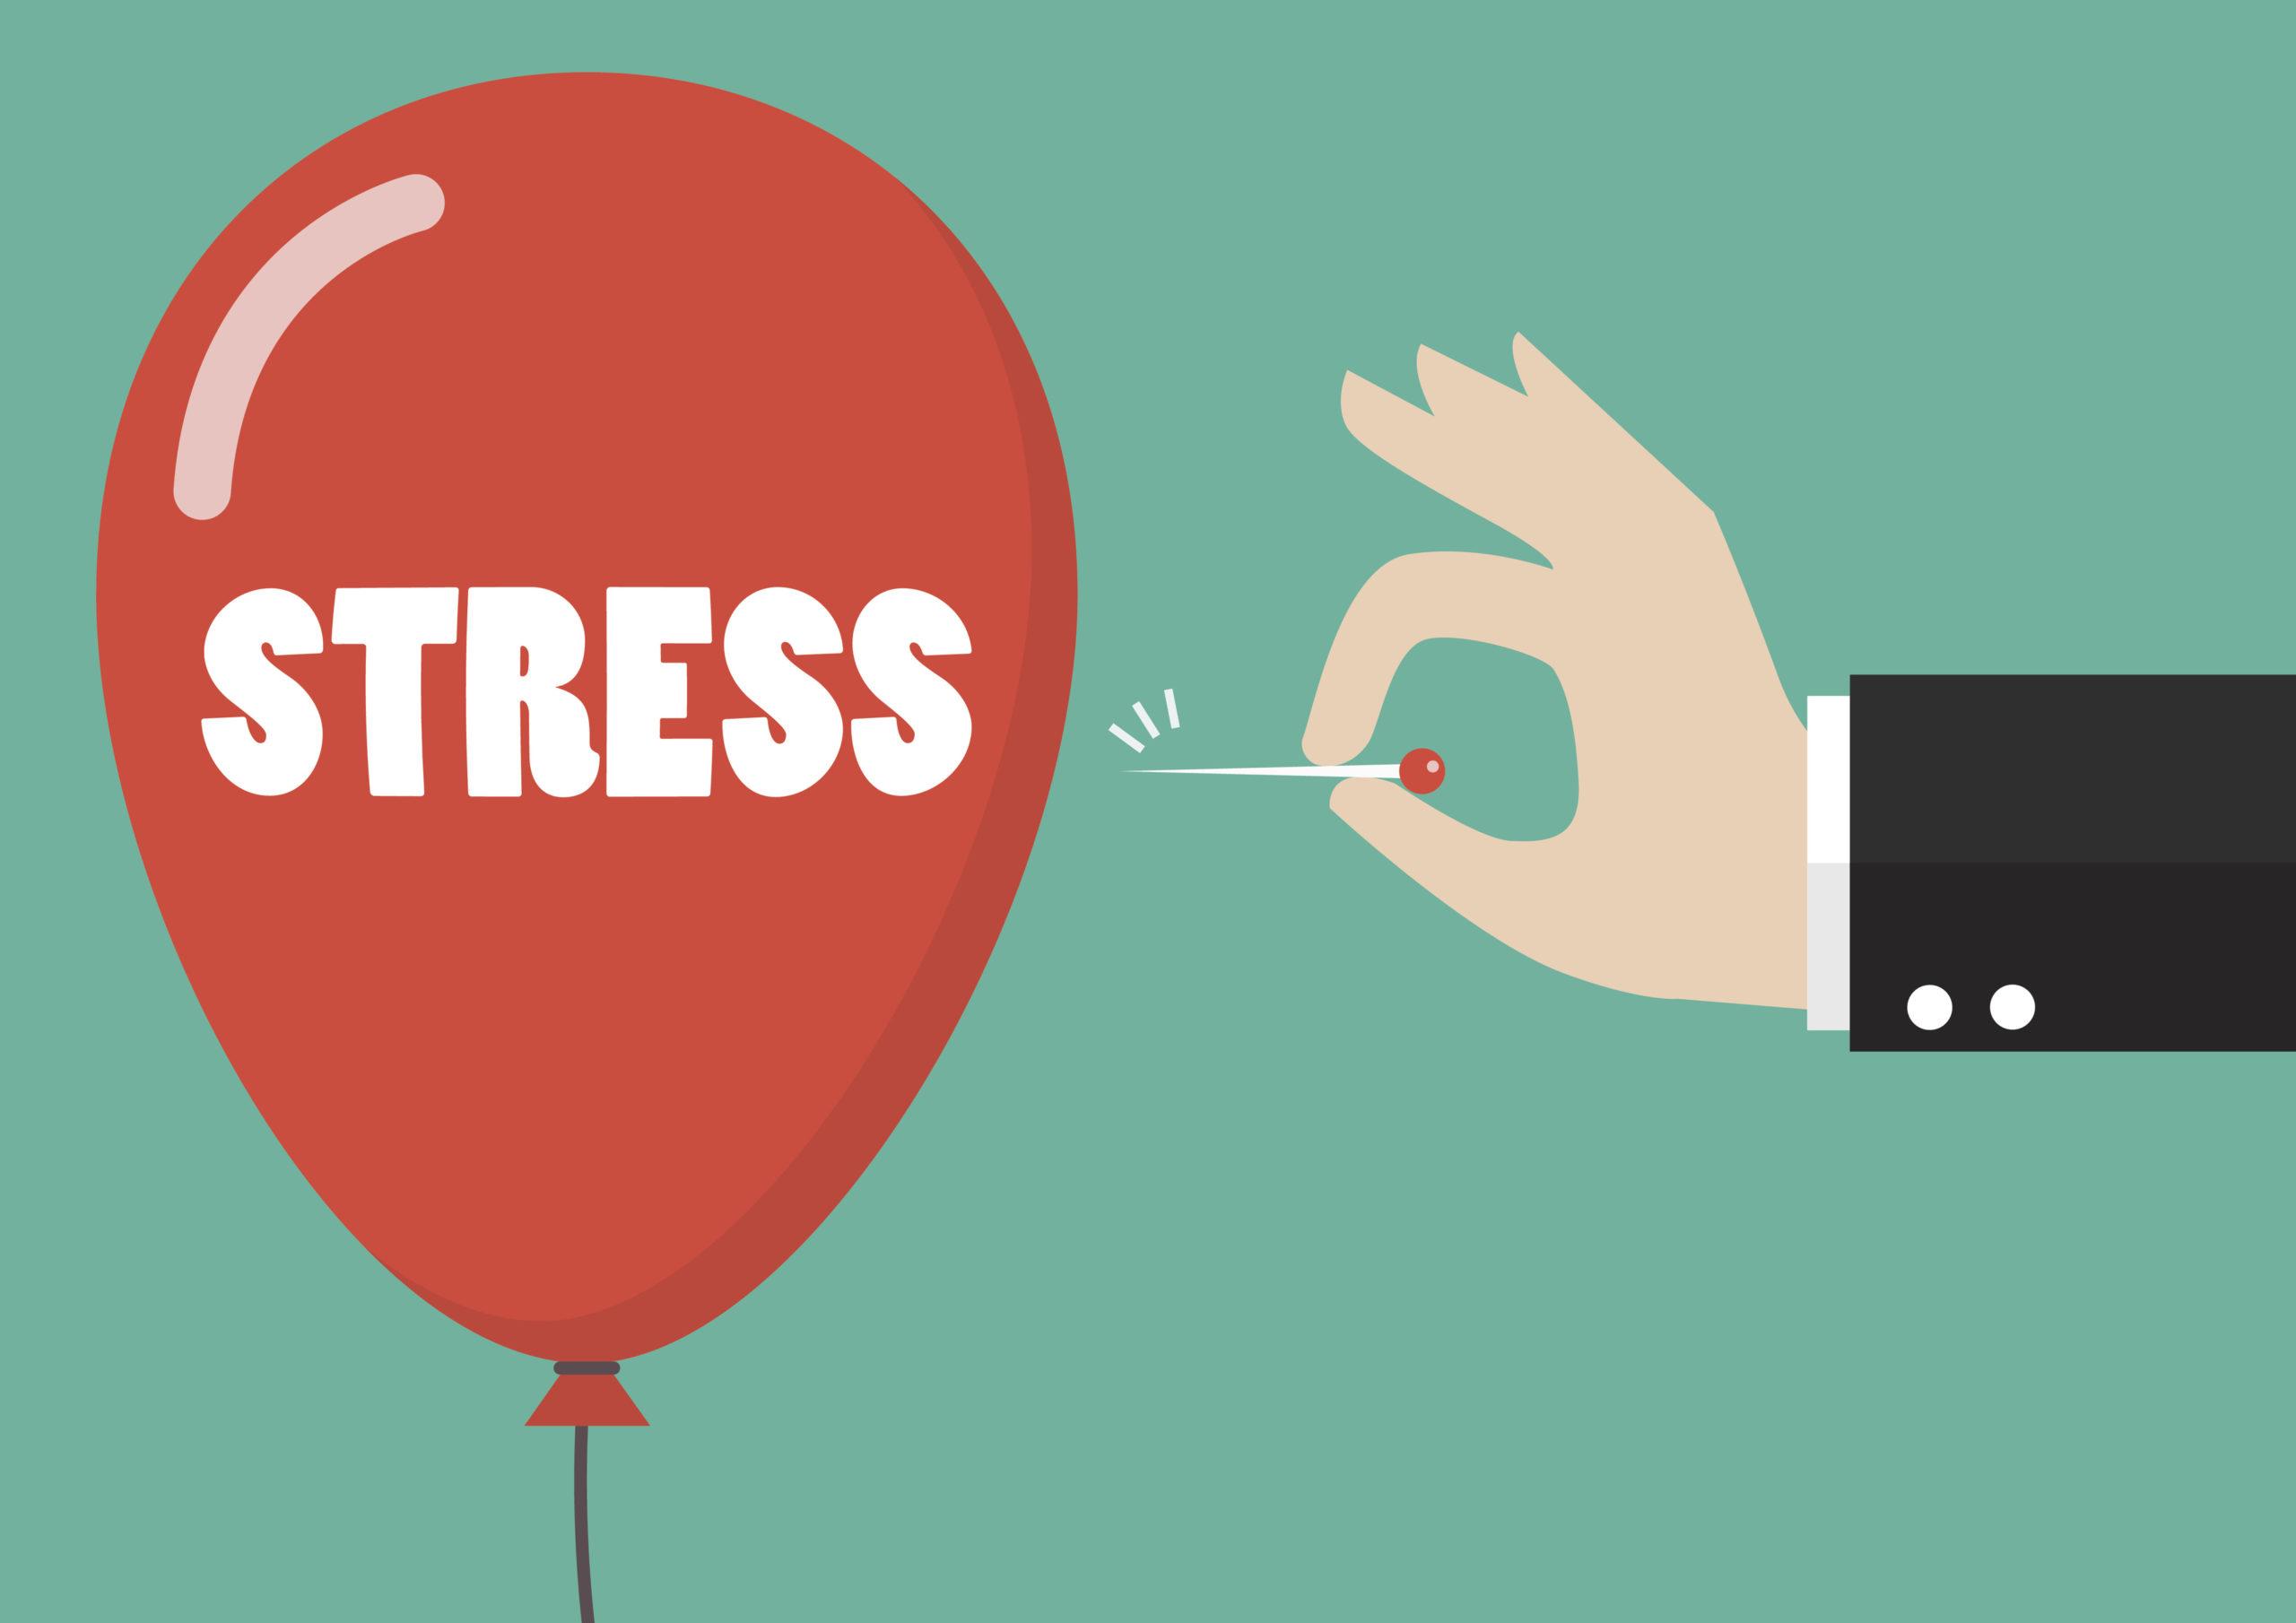 stress balloon popping